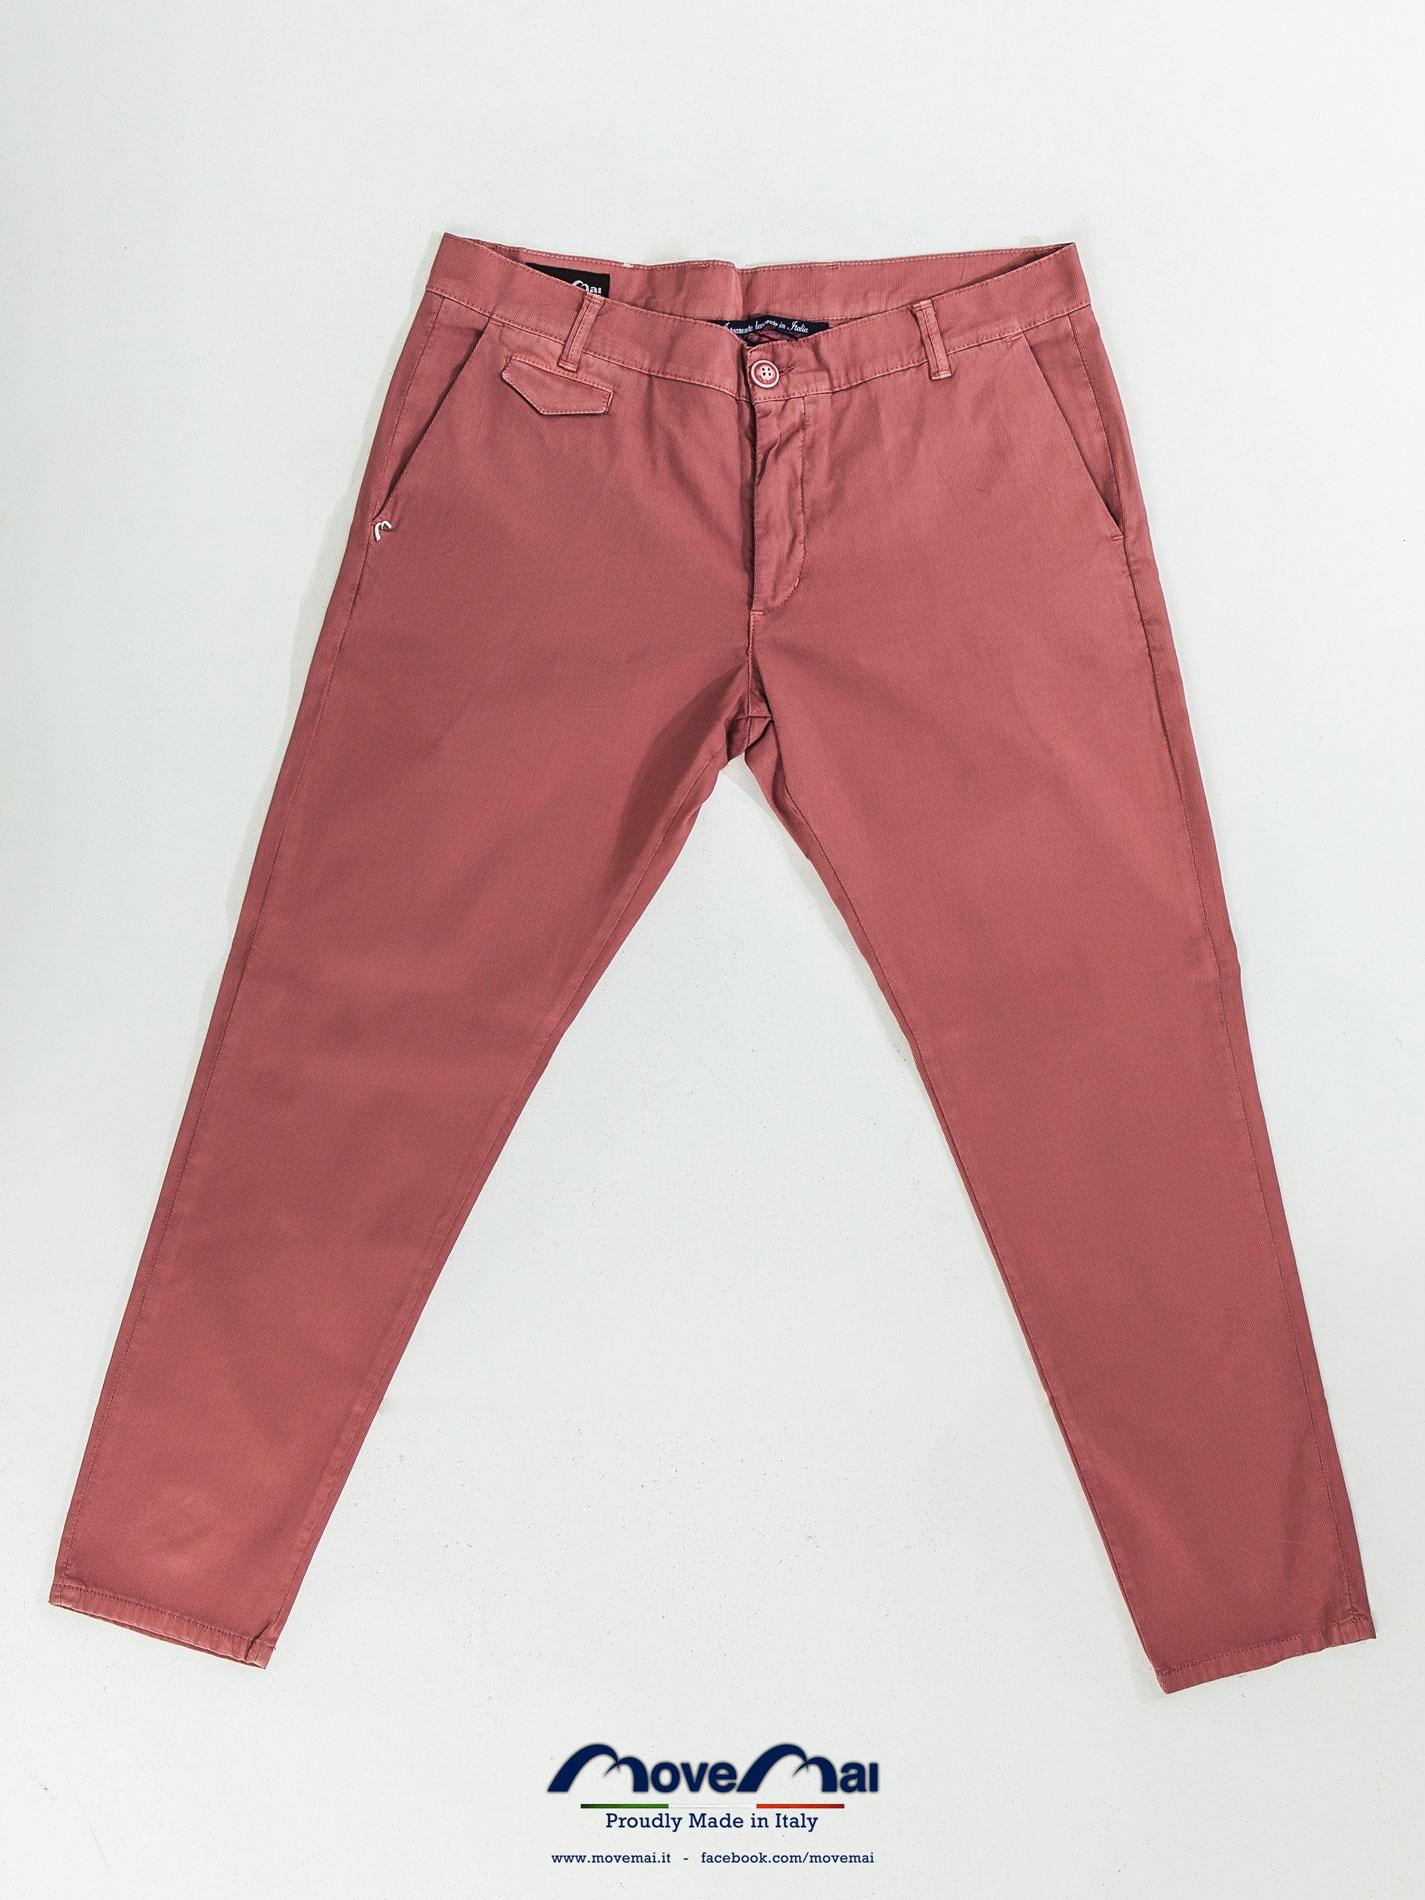 Movemai uomo | Pantalone da uomo vita bassa - cotone Piquet millerighe | Spring Summer 2013